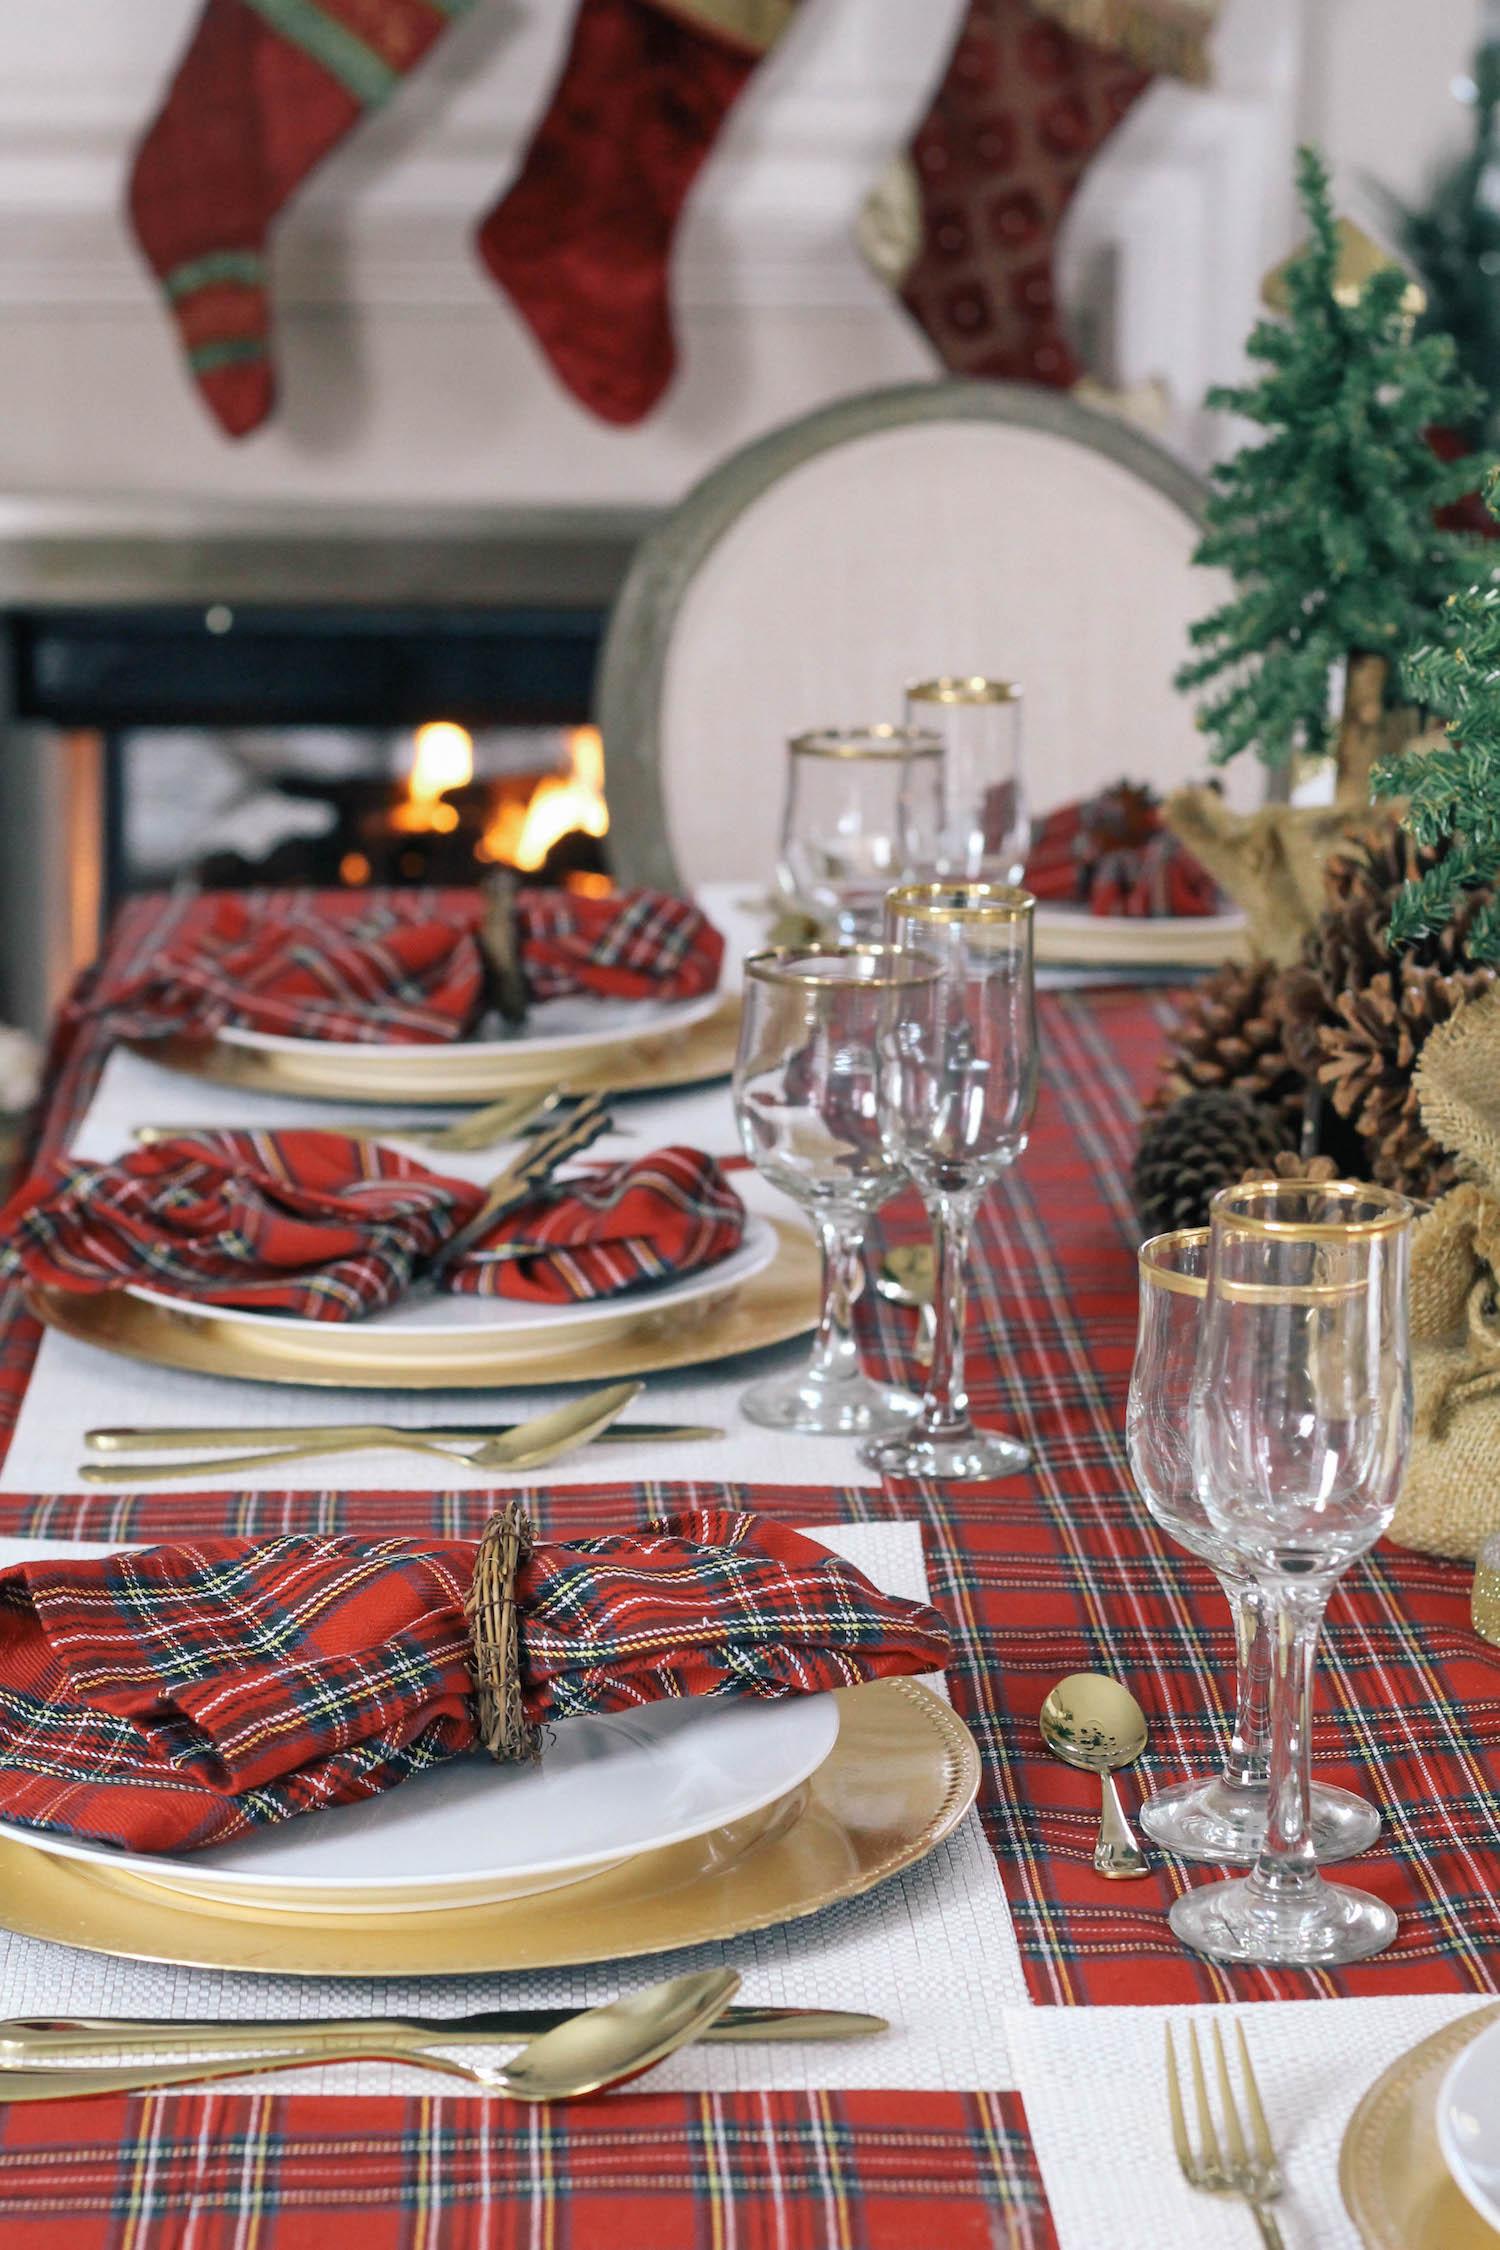 Christmas-Tablescape-Red-Plaid-Decor-8